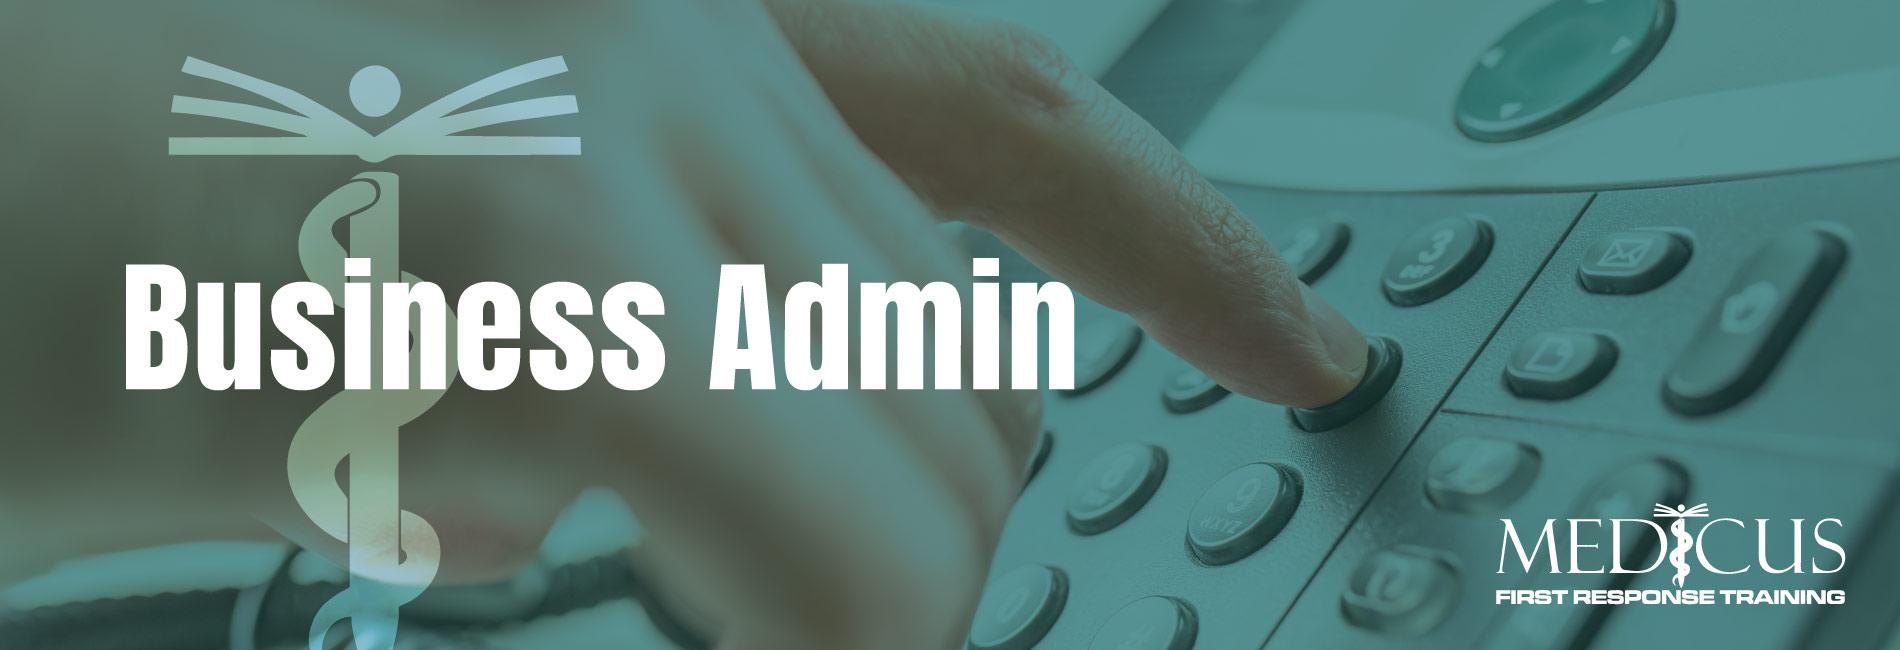 Medicus-Training-Carmarthen-Services-Business-Admin